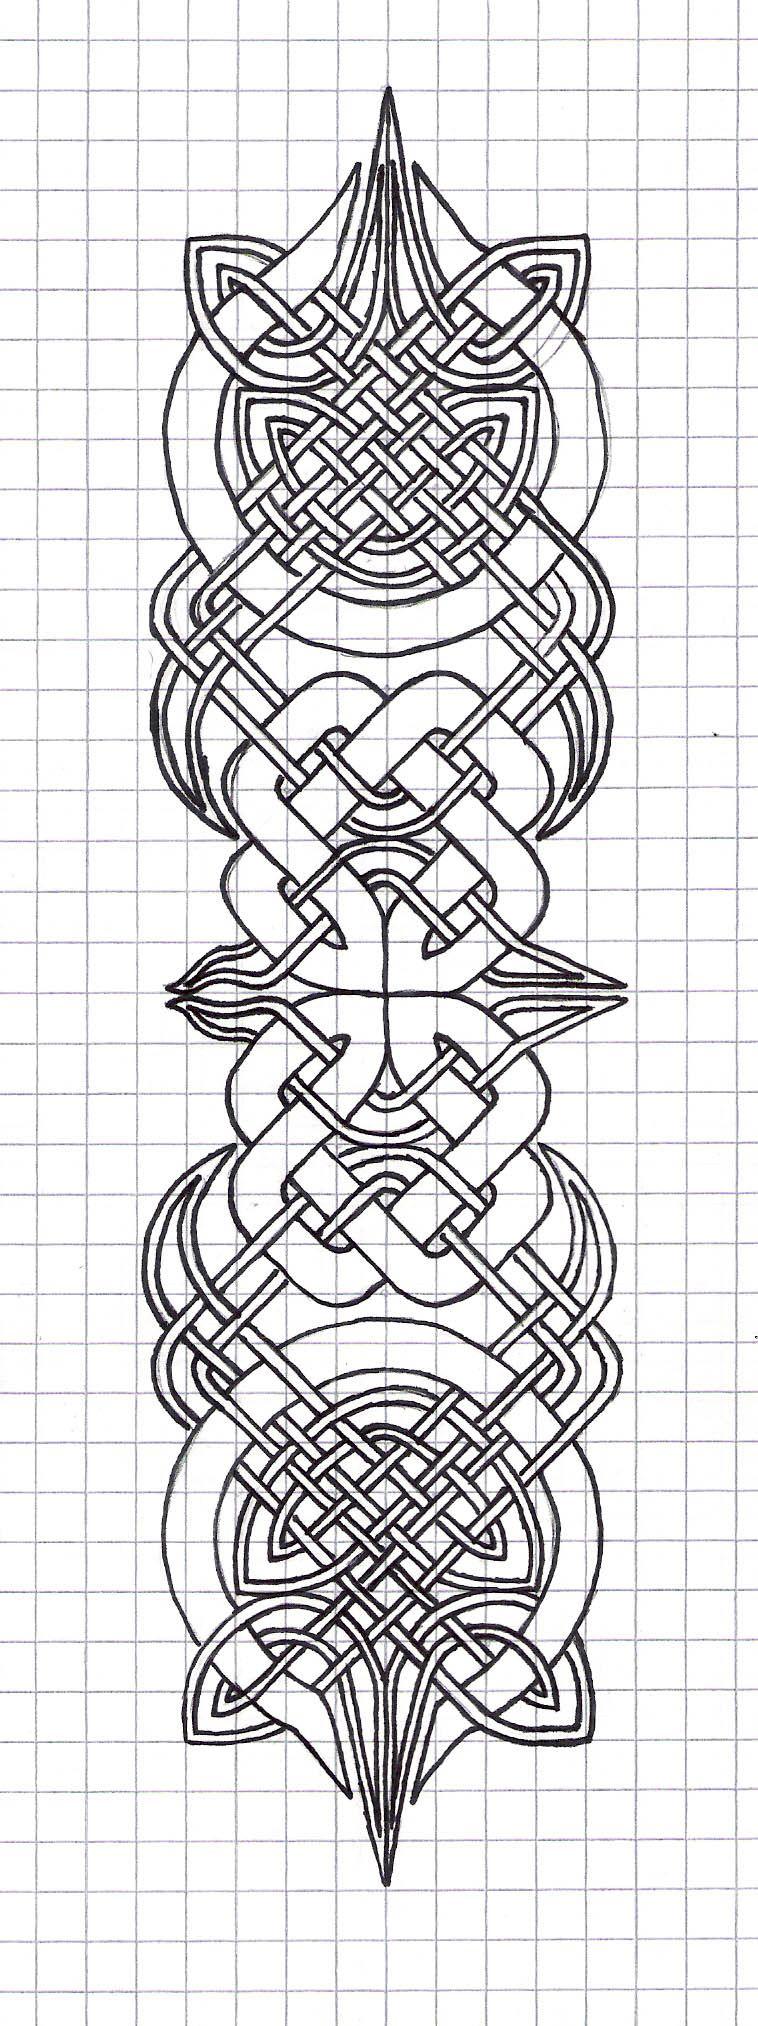 The Celtic Tarot Courtney Davis 9780850309201 Amazon: Celtic Knot Designs On Pinterest